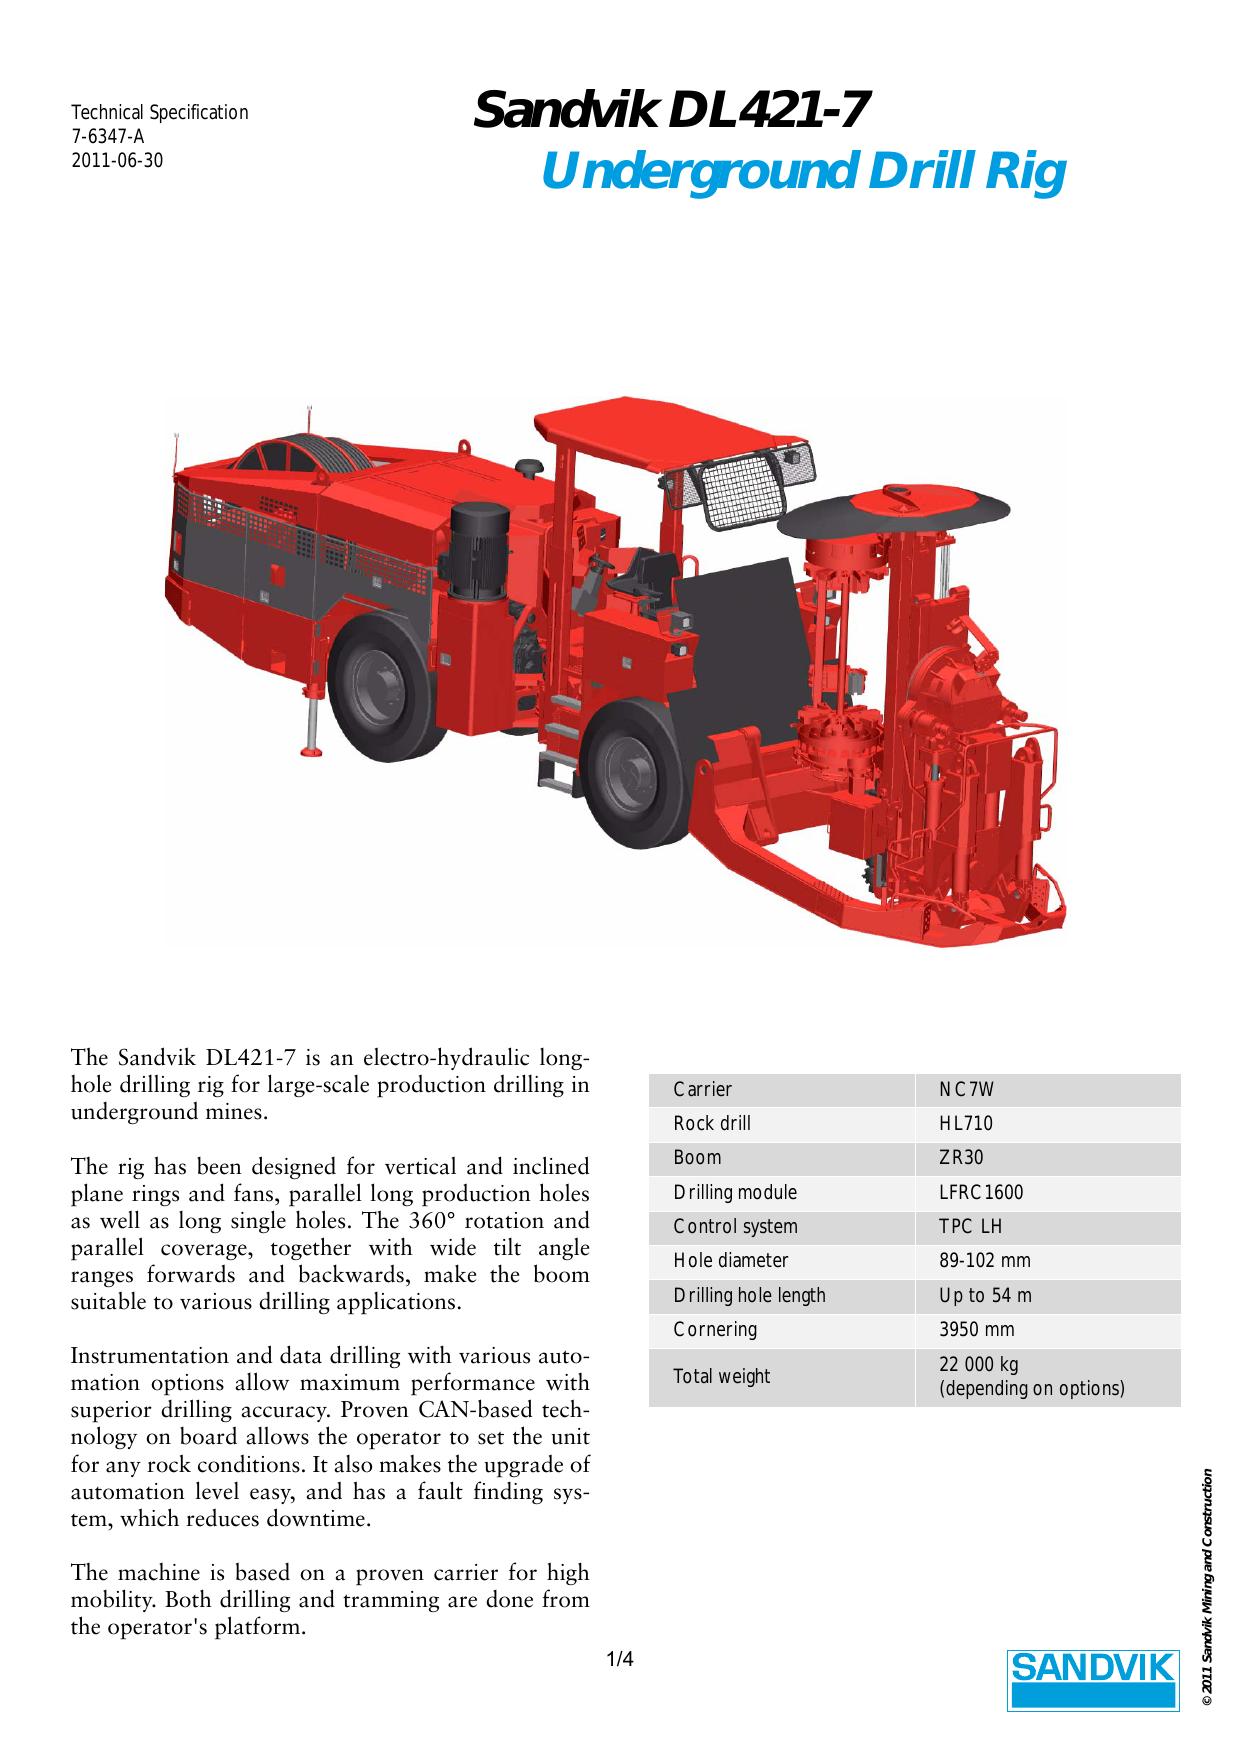 Sandvik DL421-7 Underground Drill Rig | manualzz com